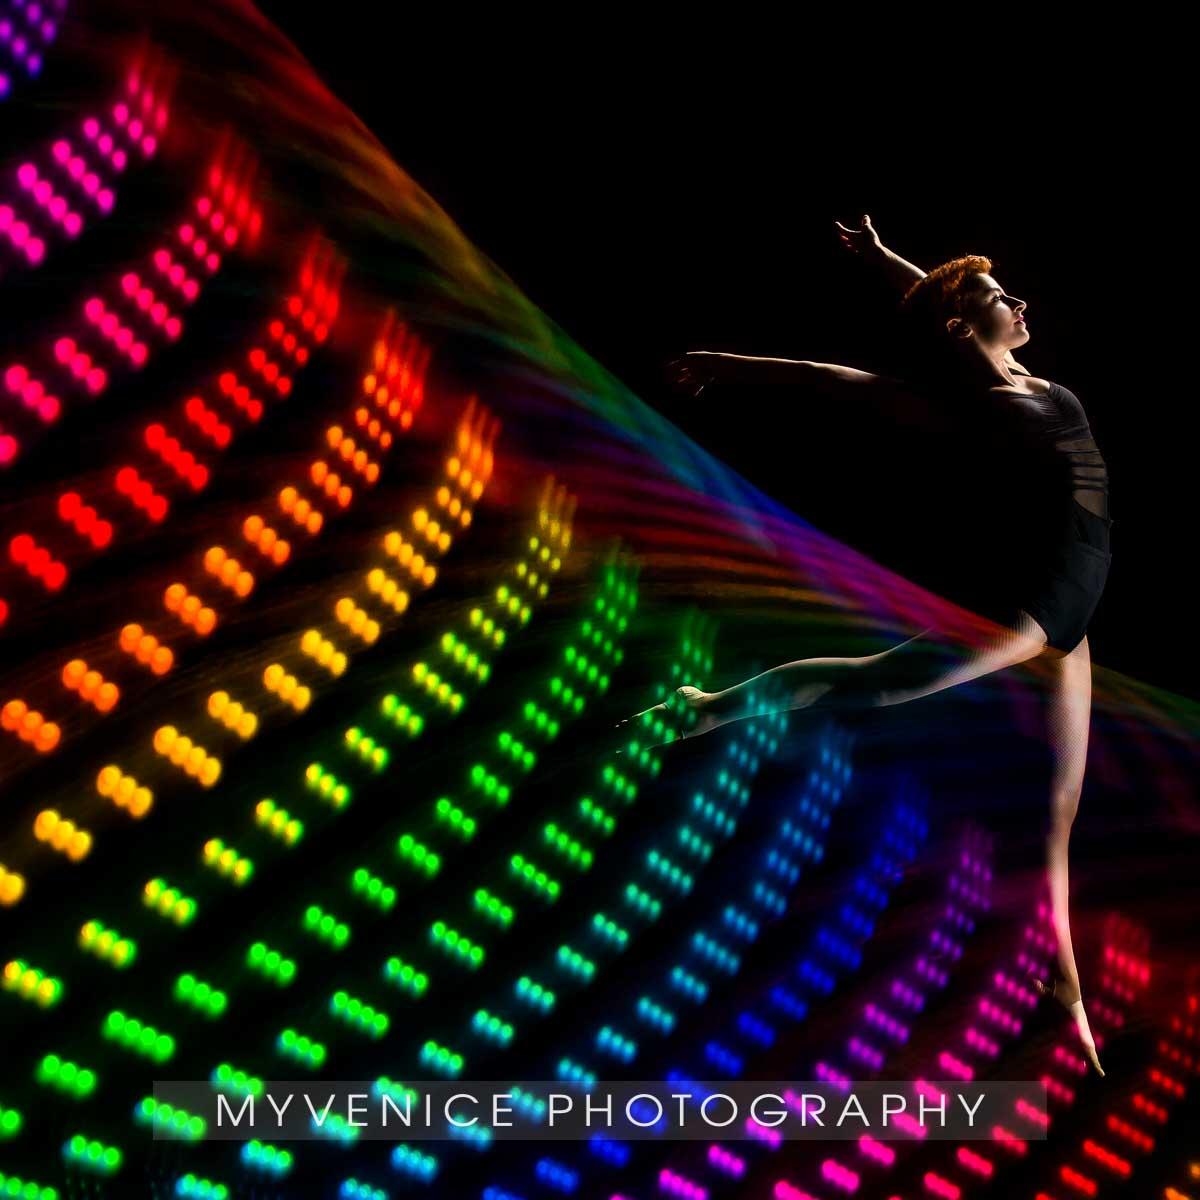 Myvenicephotography 3